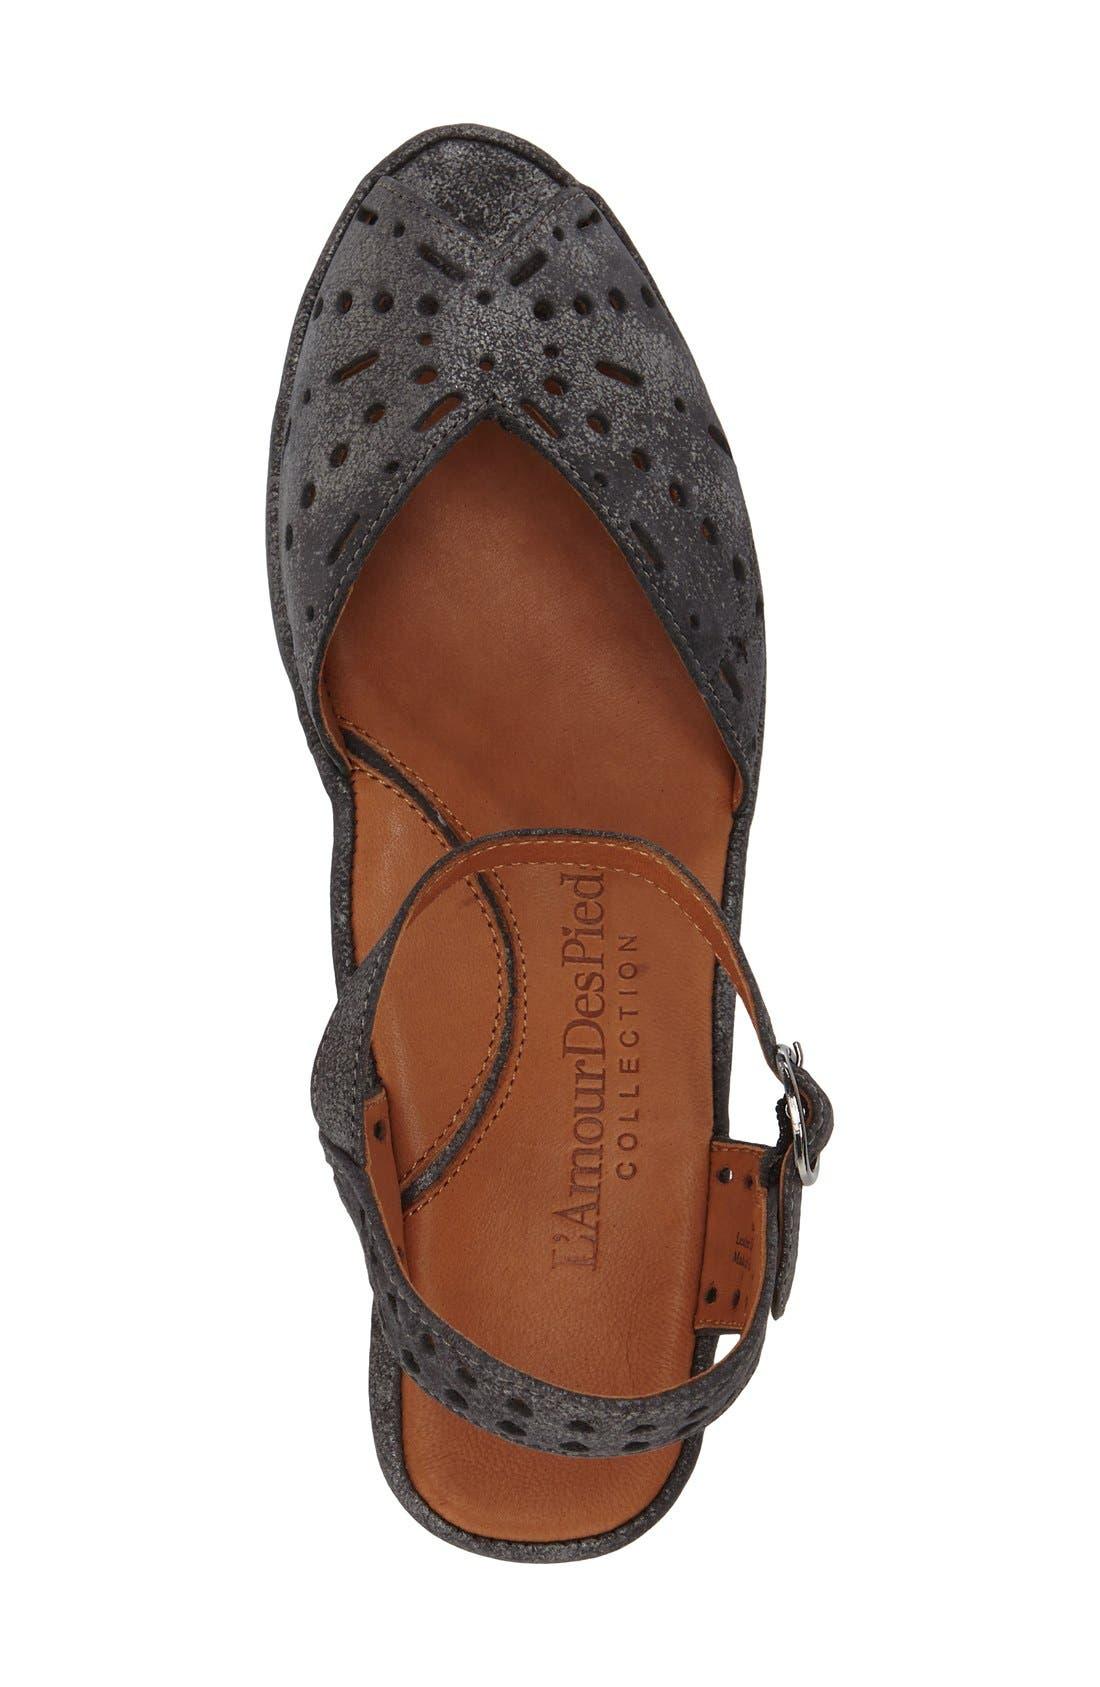 Alternate Image 3  - L'Amour des Pieds 'Brenn' Ankle Strap Sandal (Women)